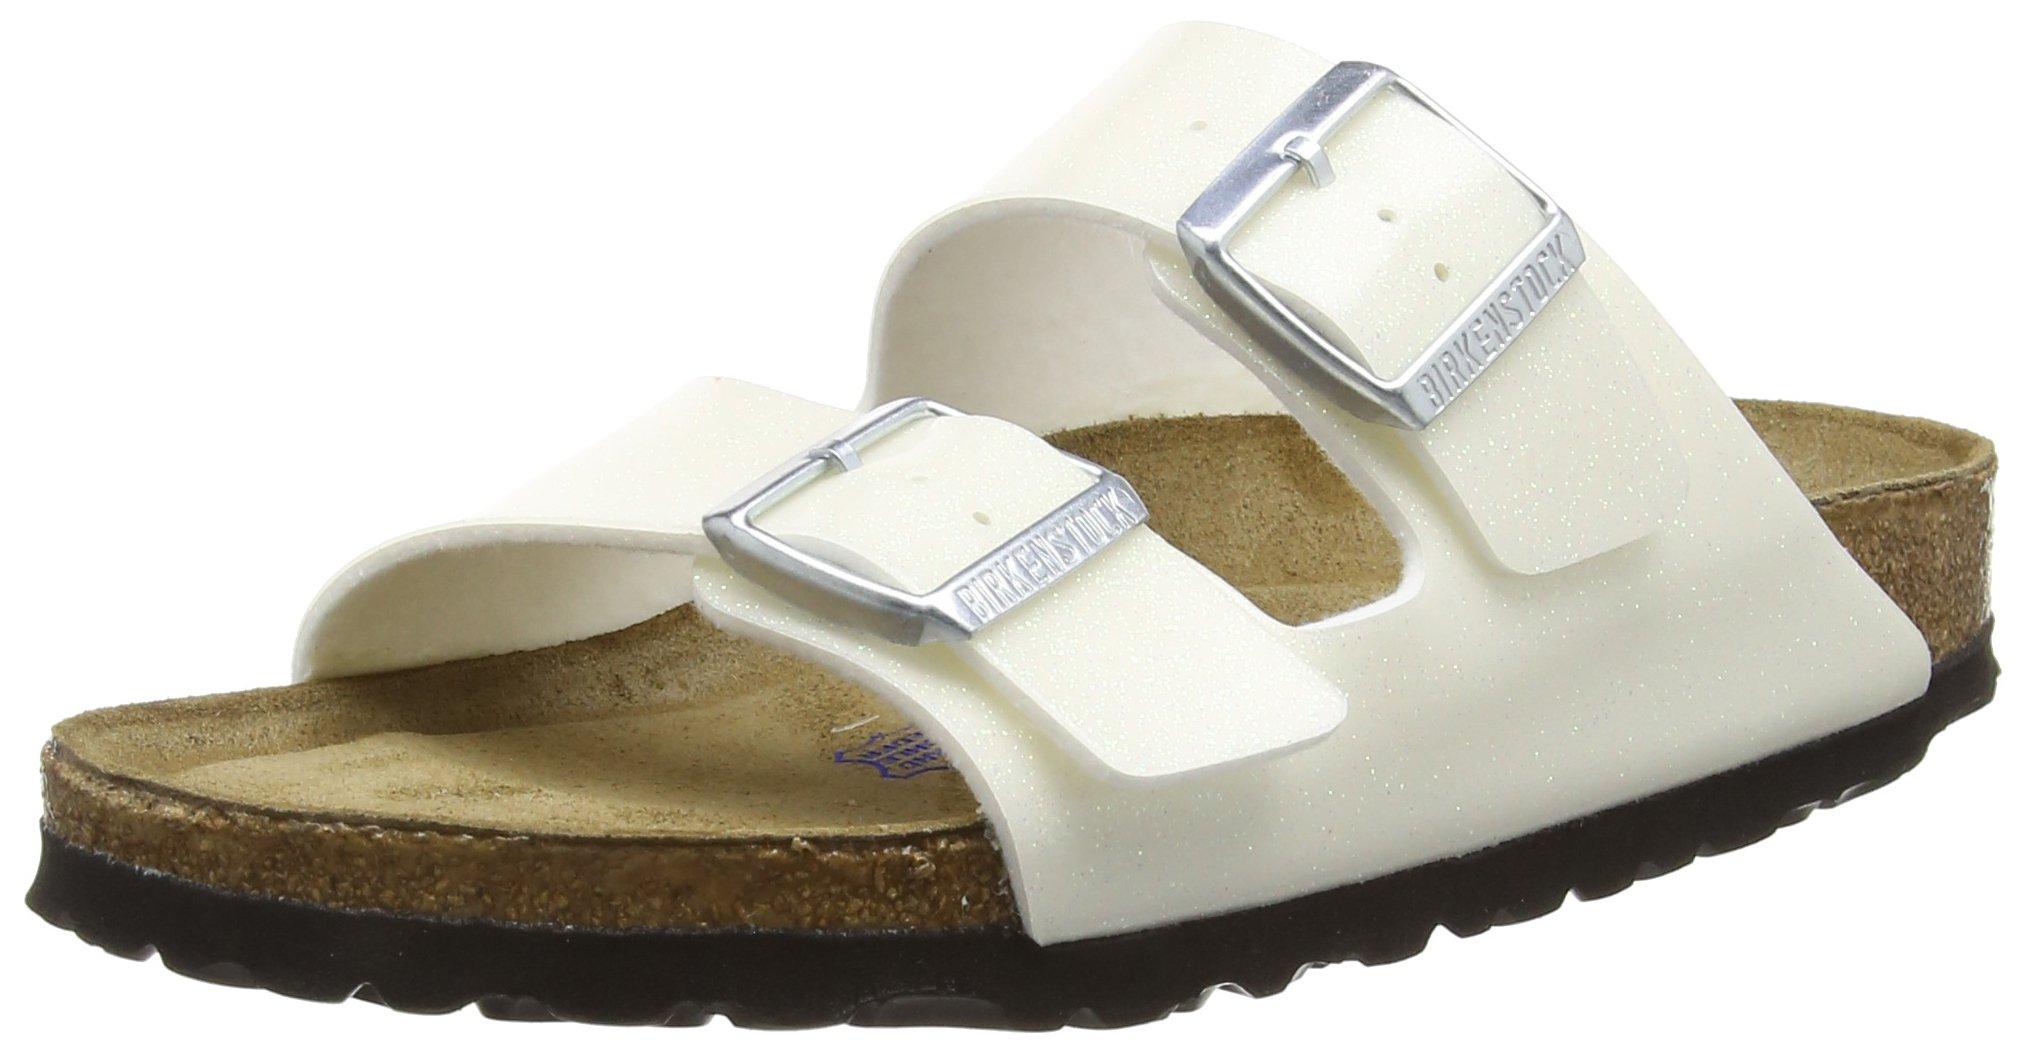 Birkenstock Unisex Arizona Magic Galaxy White Sandals - 6-6.5 2A(N) US Women